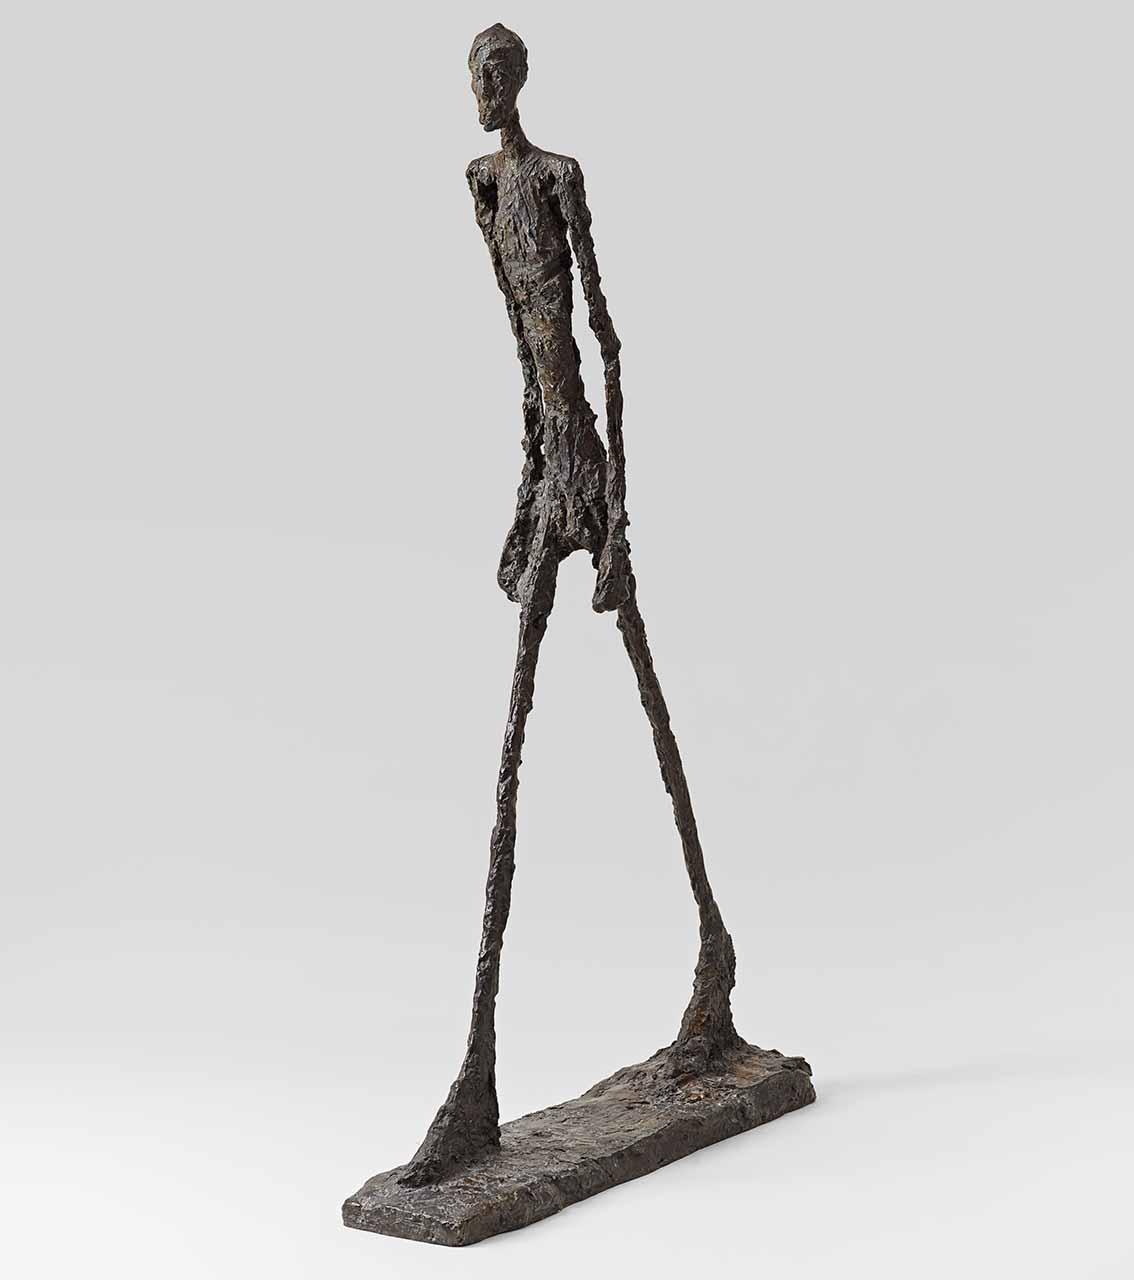 Giacometti dialoga con los grandes maestros del Prado Artes & contextos FOTO 2 915dda6e 29c0 0ec3 488c 02a8f60047fc